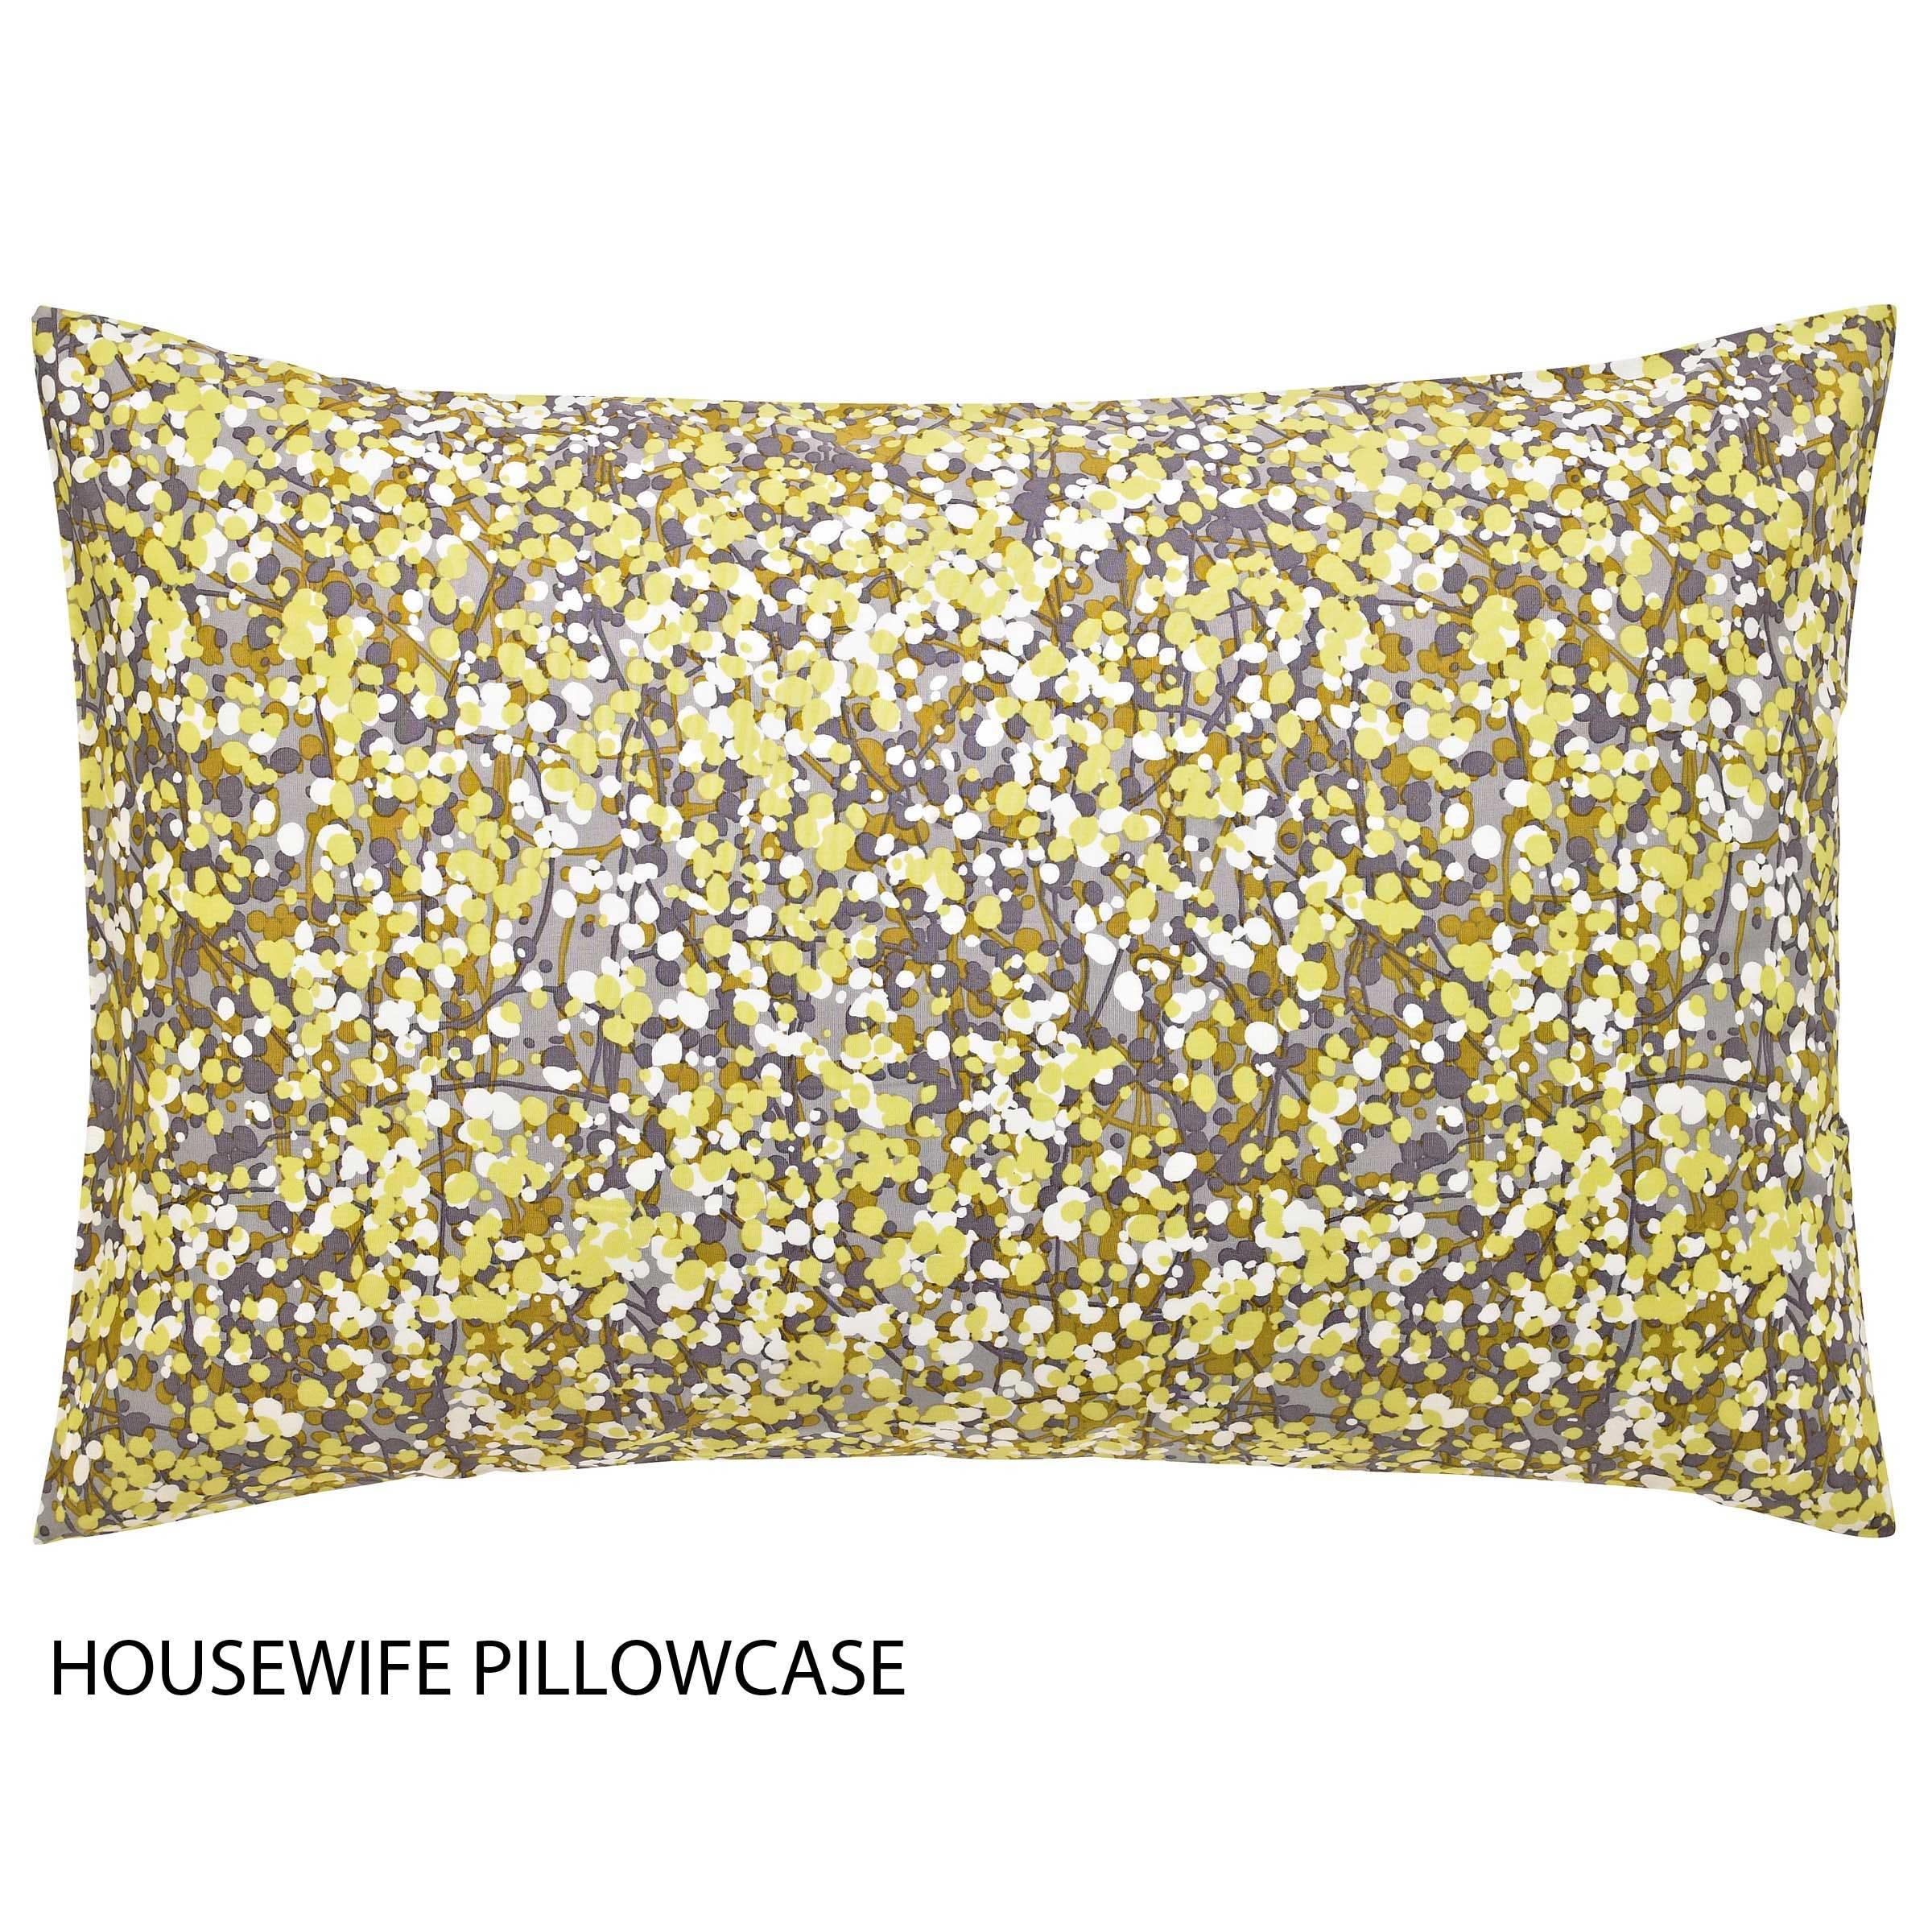 Clarissa Hulsa Boston Ivy Housewife Pillowcase Sulphur